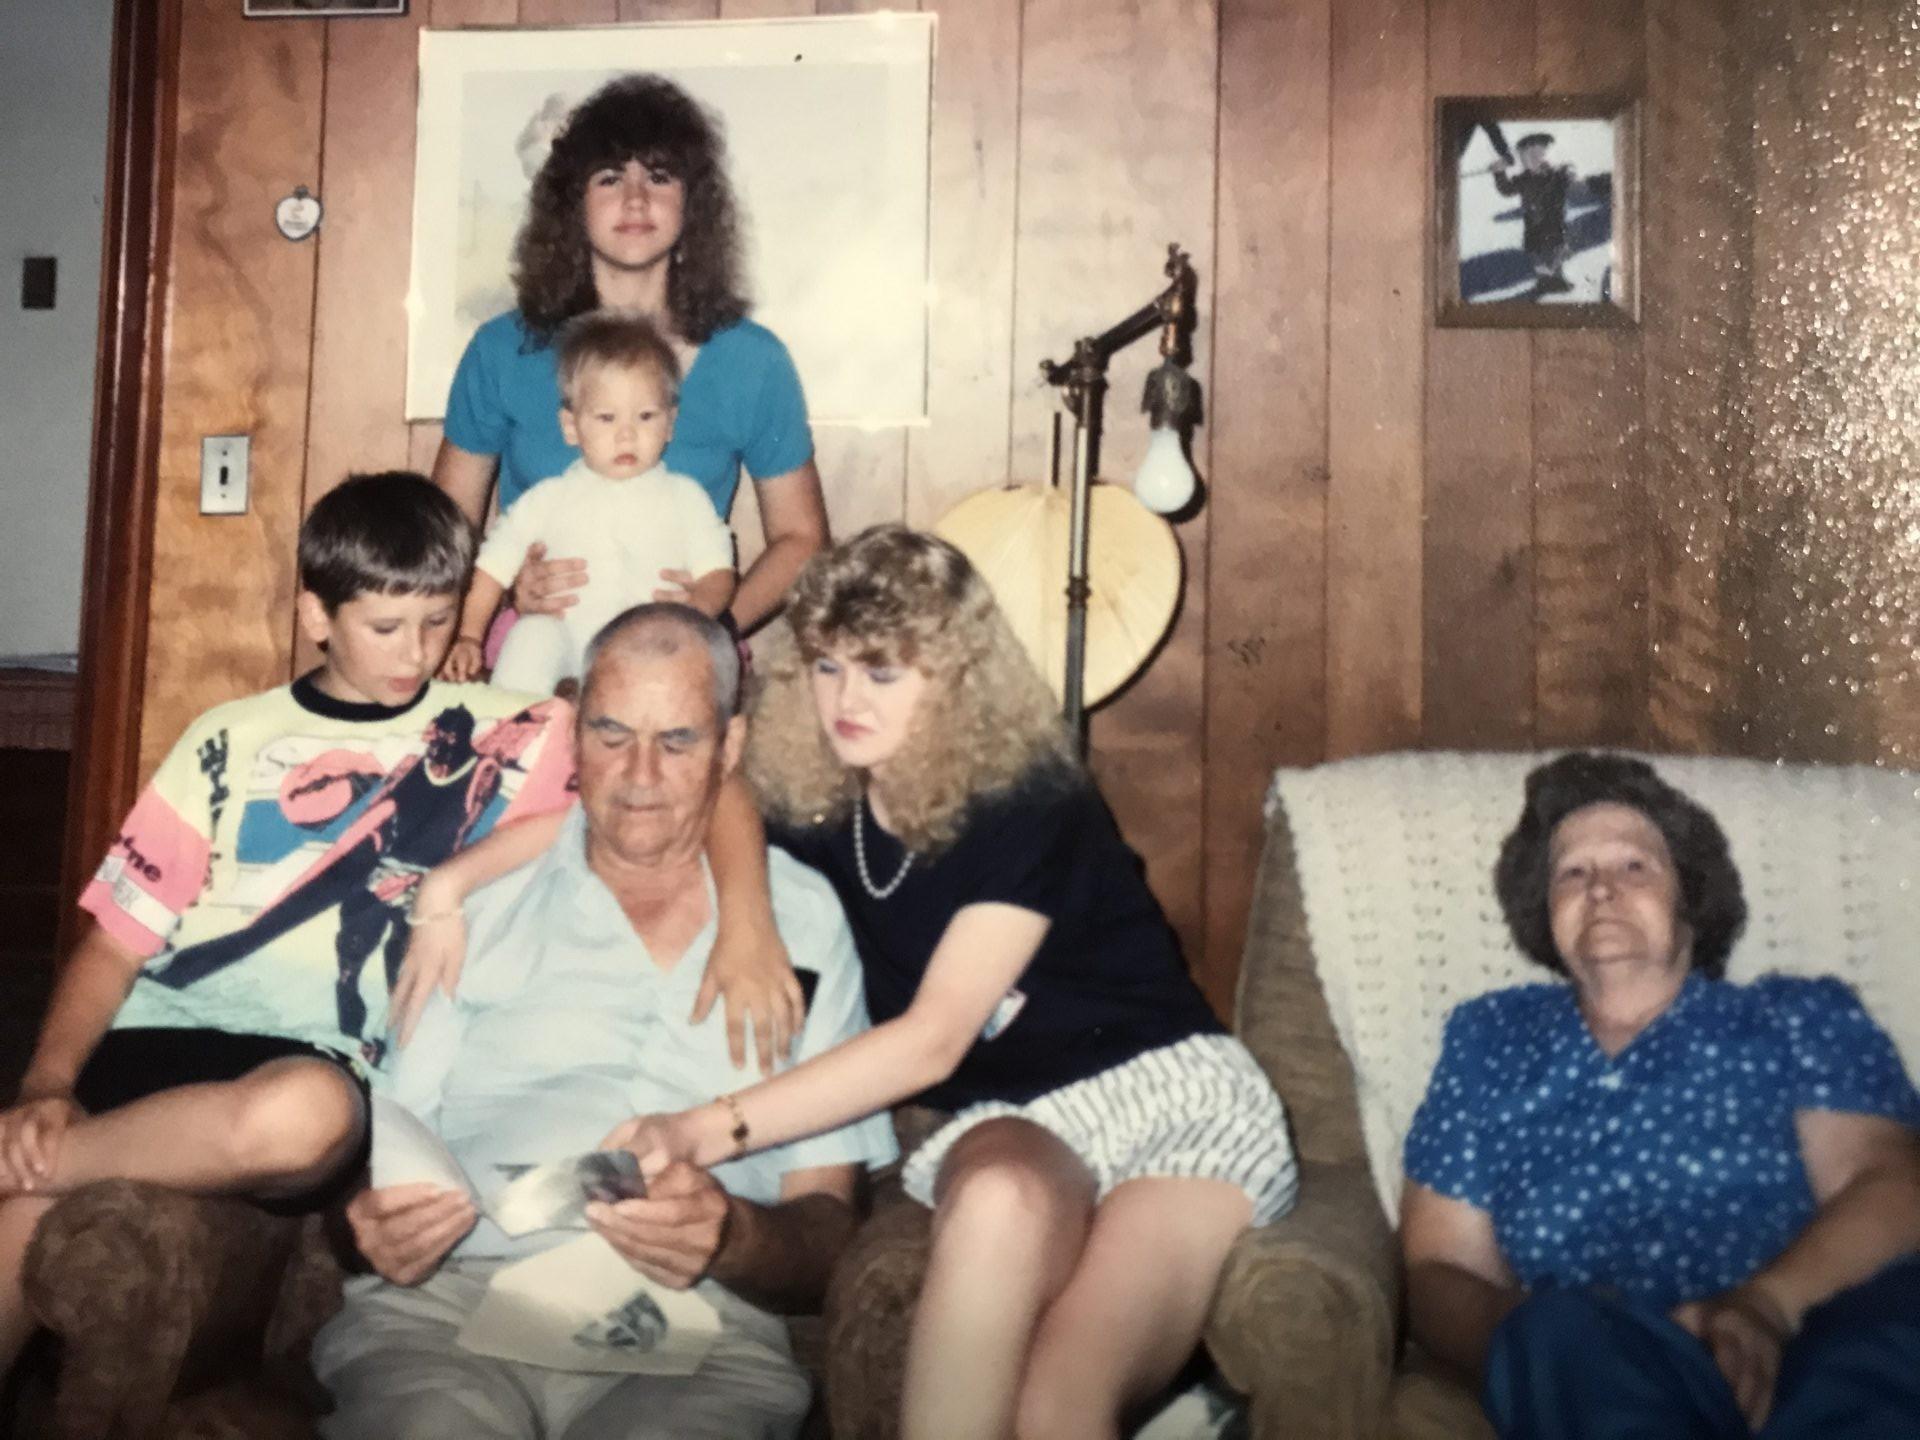 Kenny, Chris, Kelly, Vickie, Papa and Mema